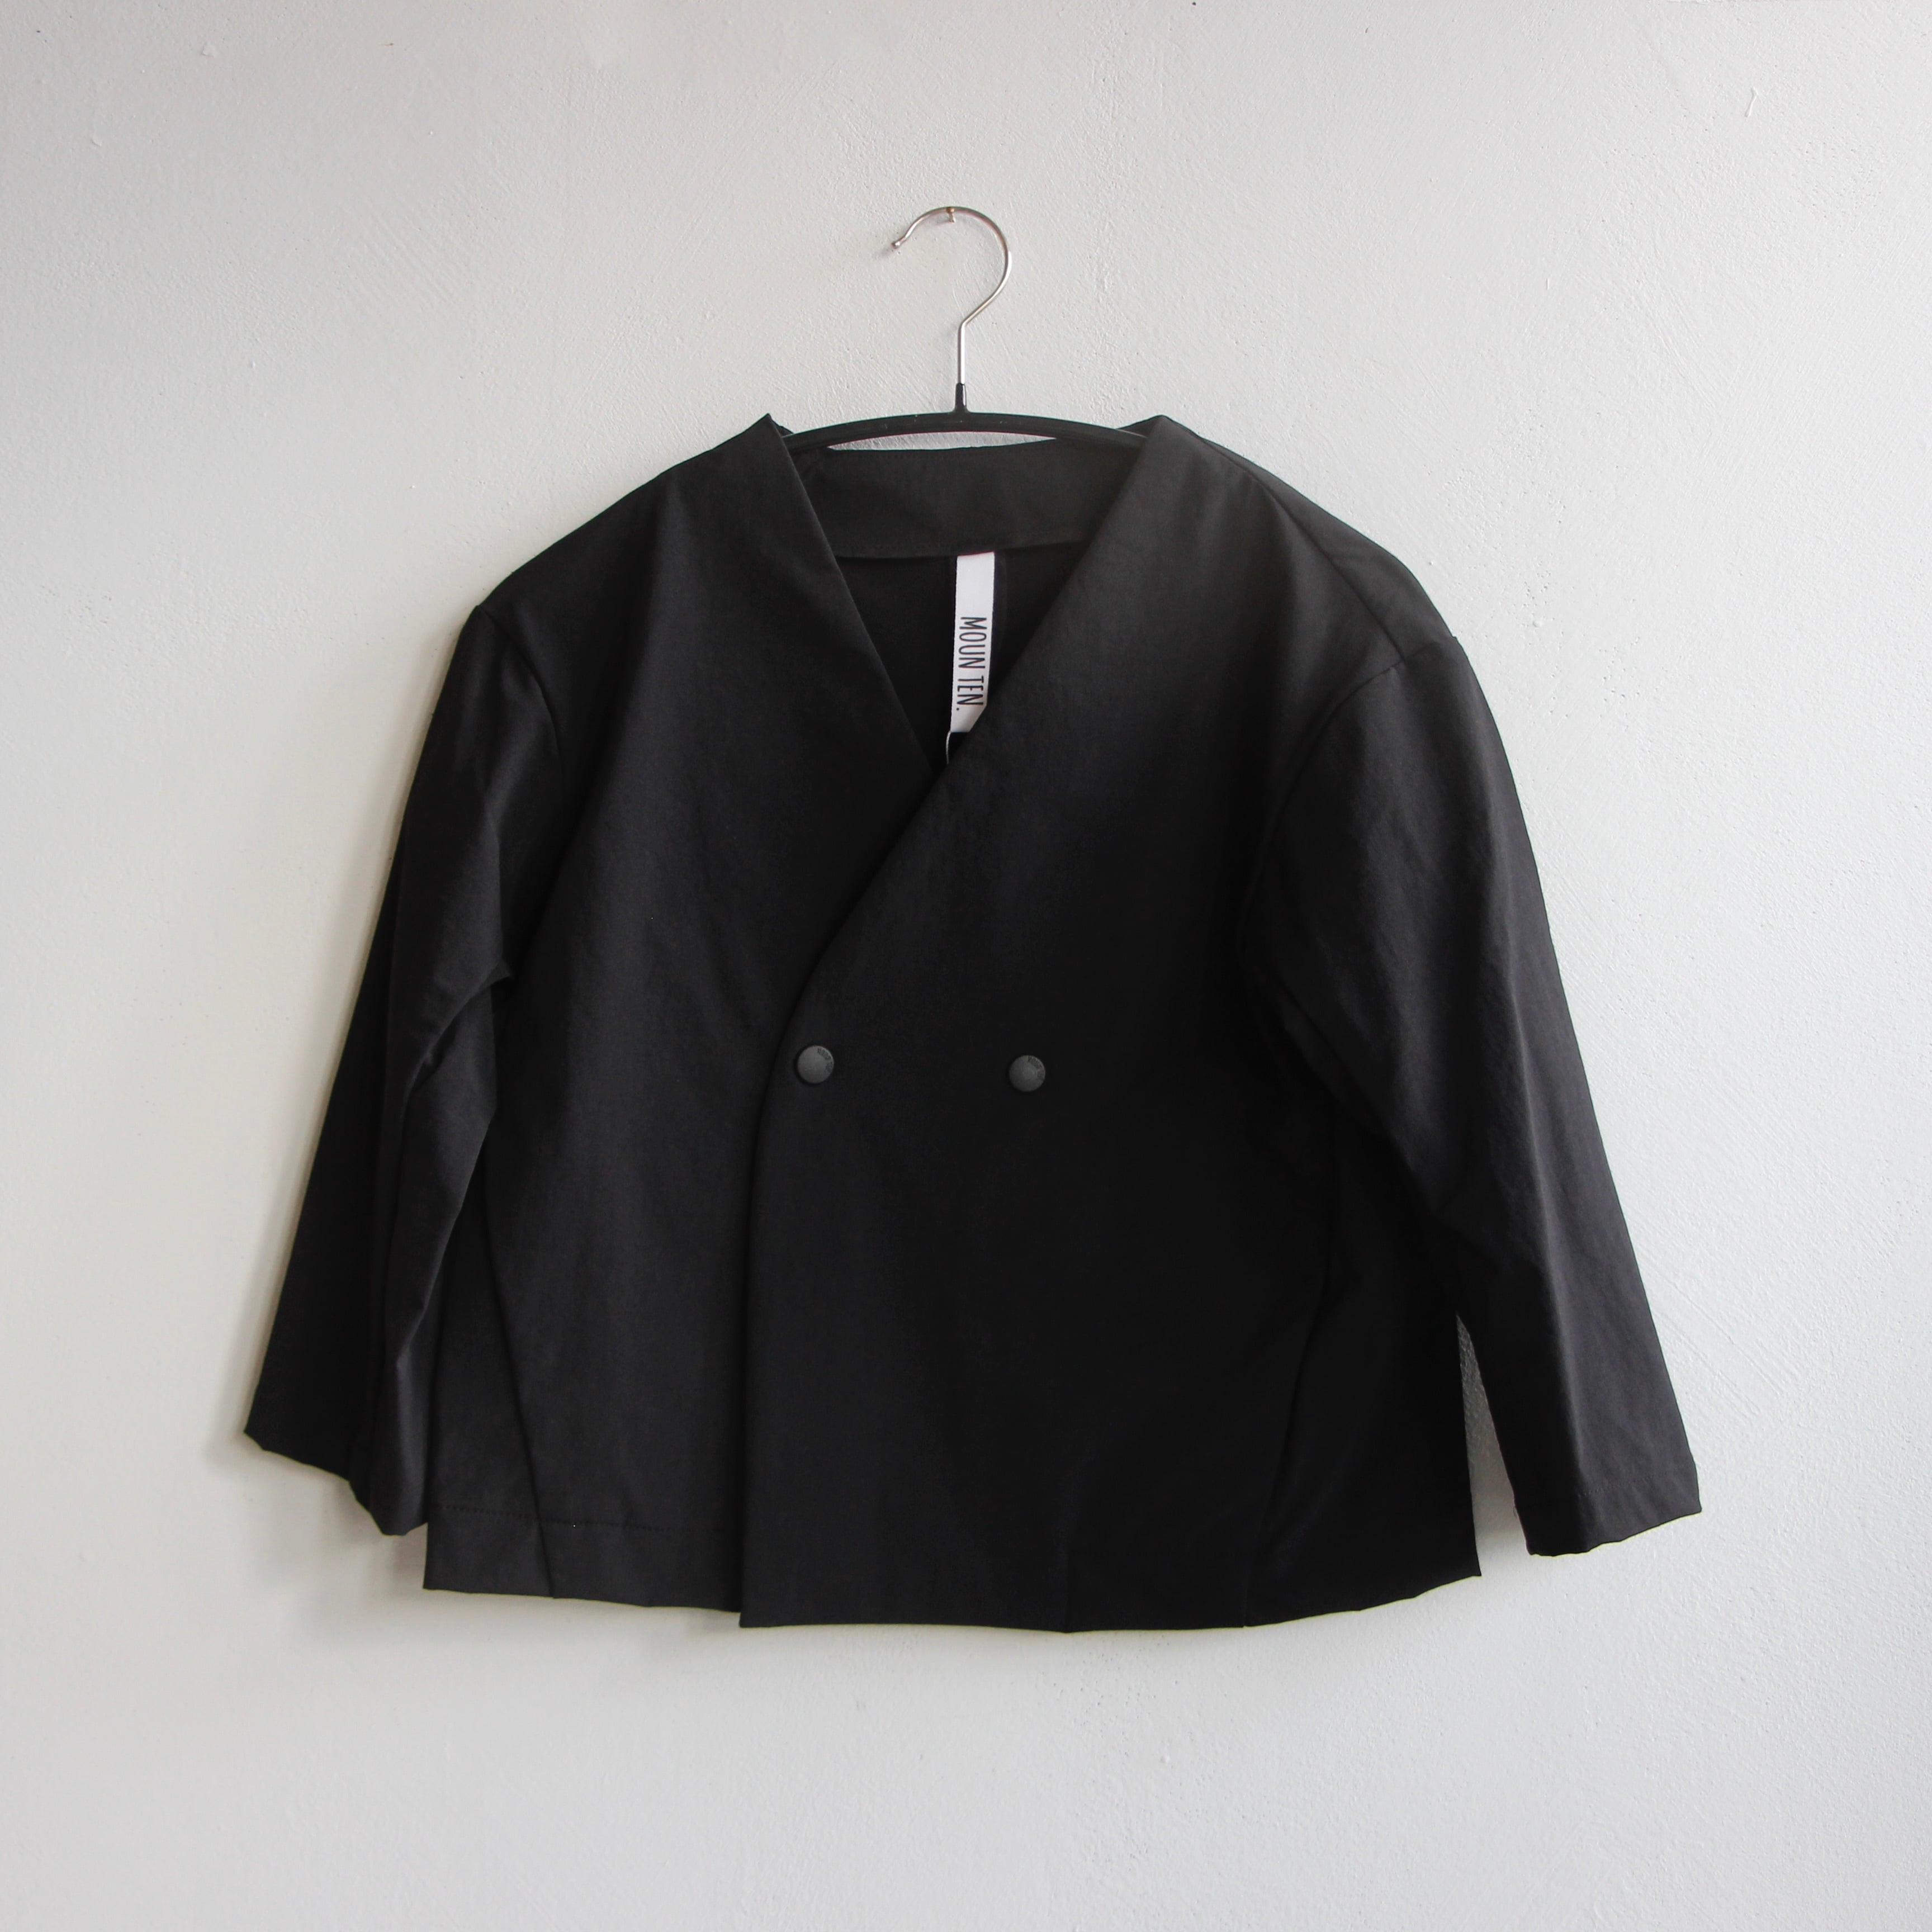 《MOUNTEN. 2021AW》double cloth stretch jacket / black